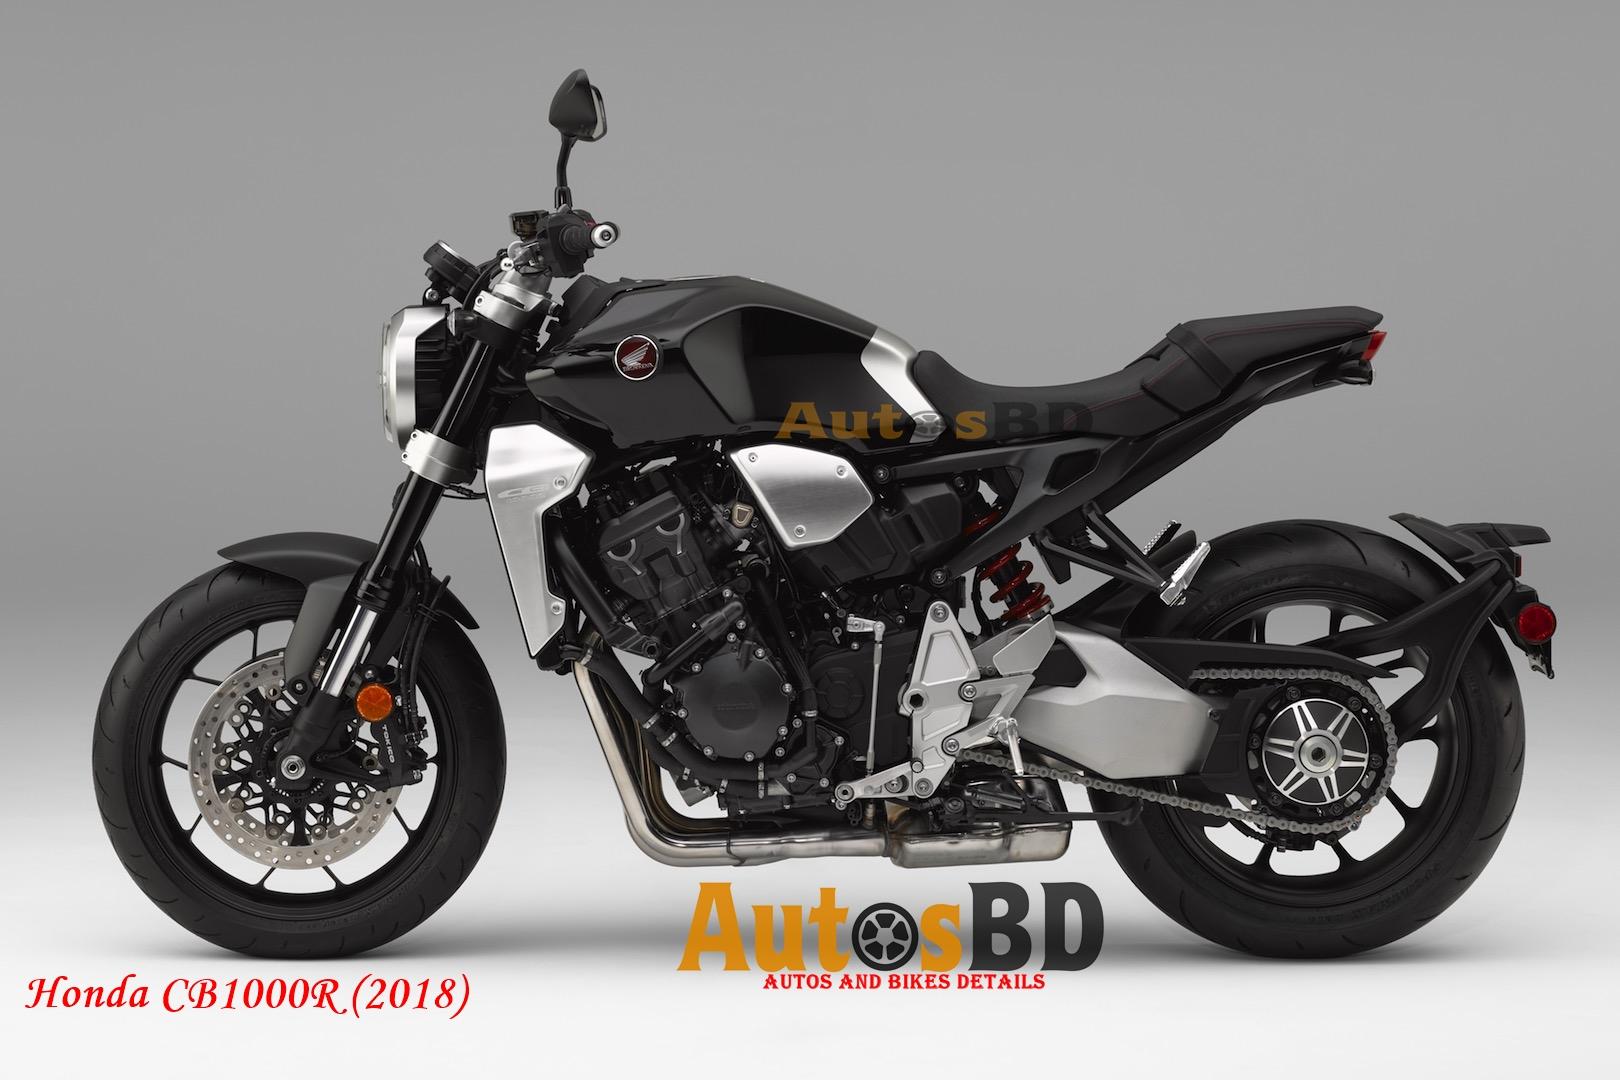 honda cb1000r 2018 motorcycle price in india. Black Bedroom Furniture Sets. Home Design Ideas